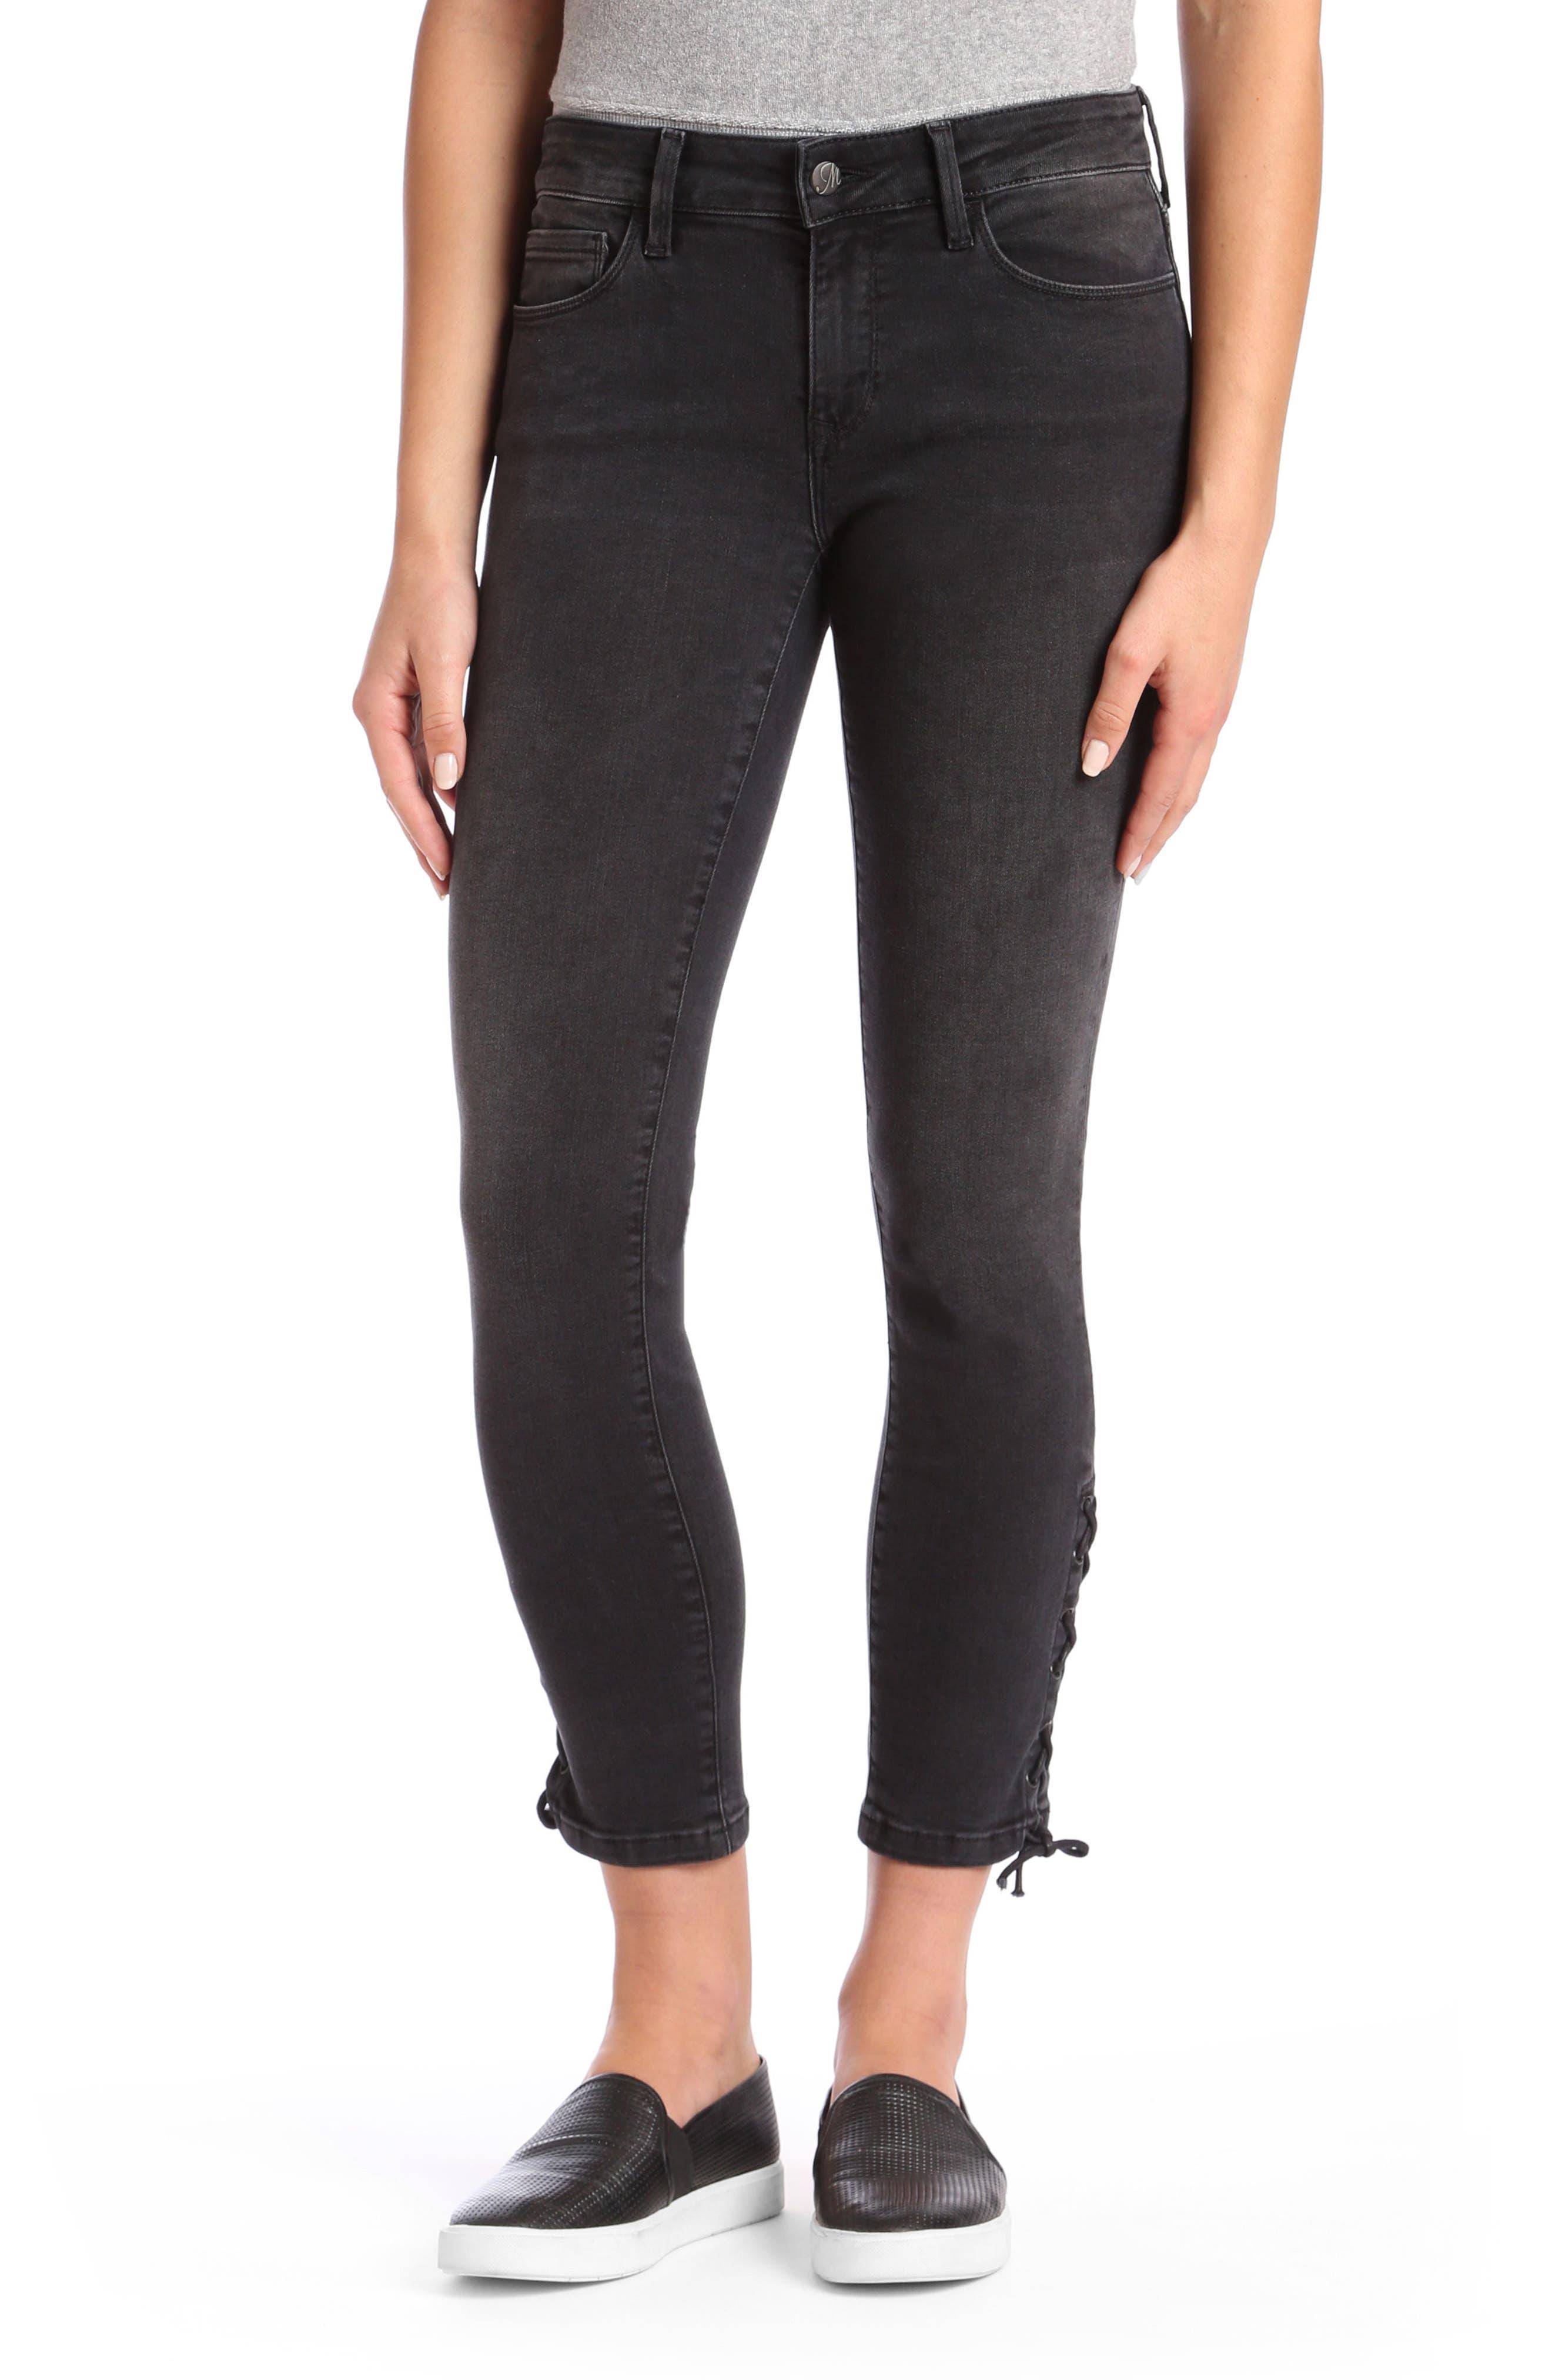 Mavi Adriana Lace Up Ankle Super Skinny Jeans (Smoke Lace)